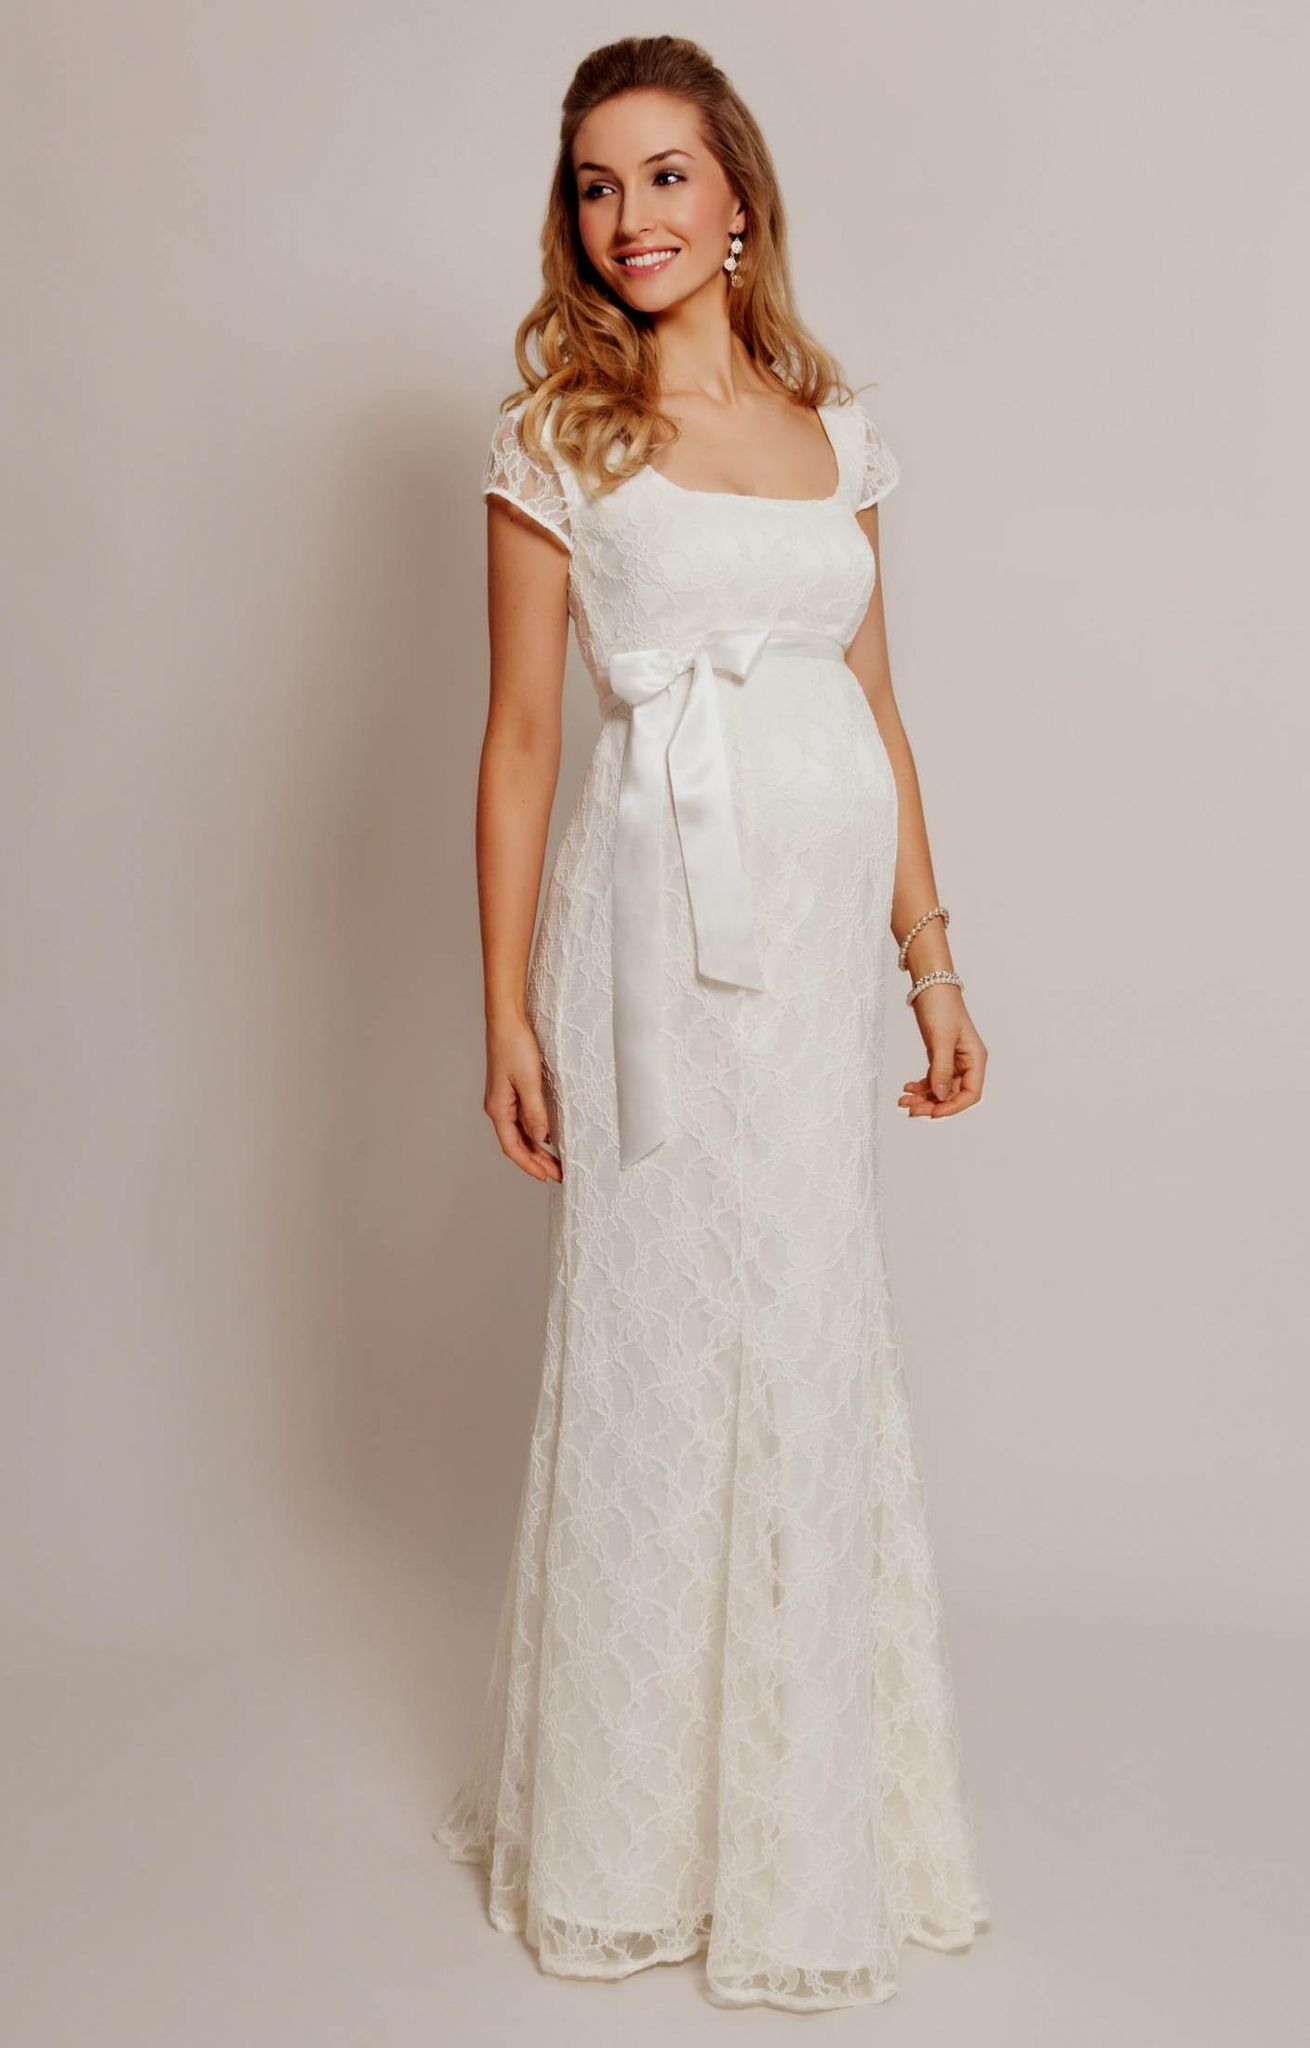 Affordable Maternity Wedding Dresses - Plus Size Dresses for Wedding ...